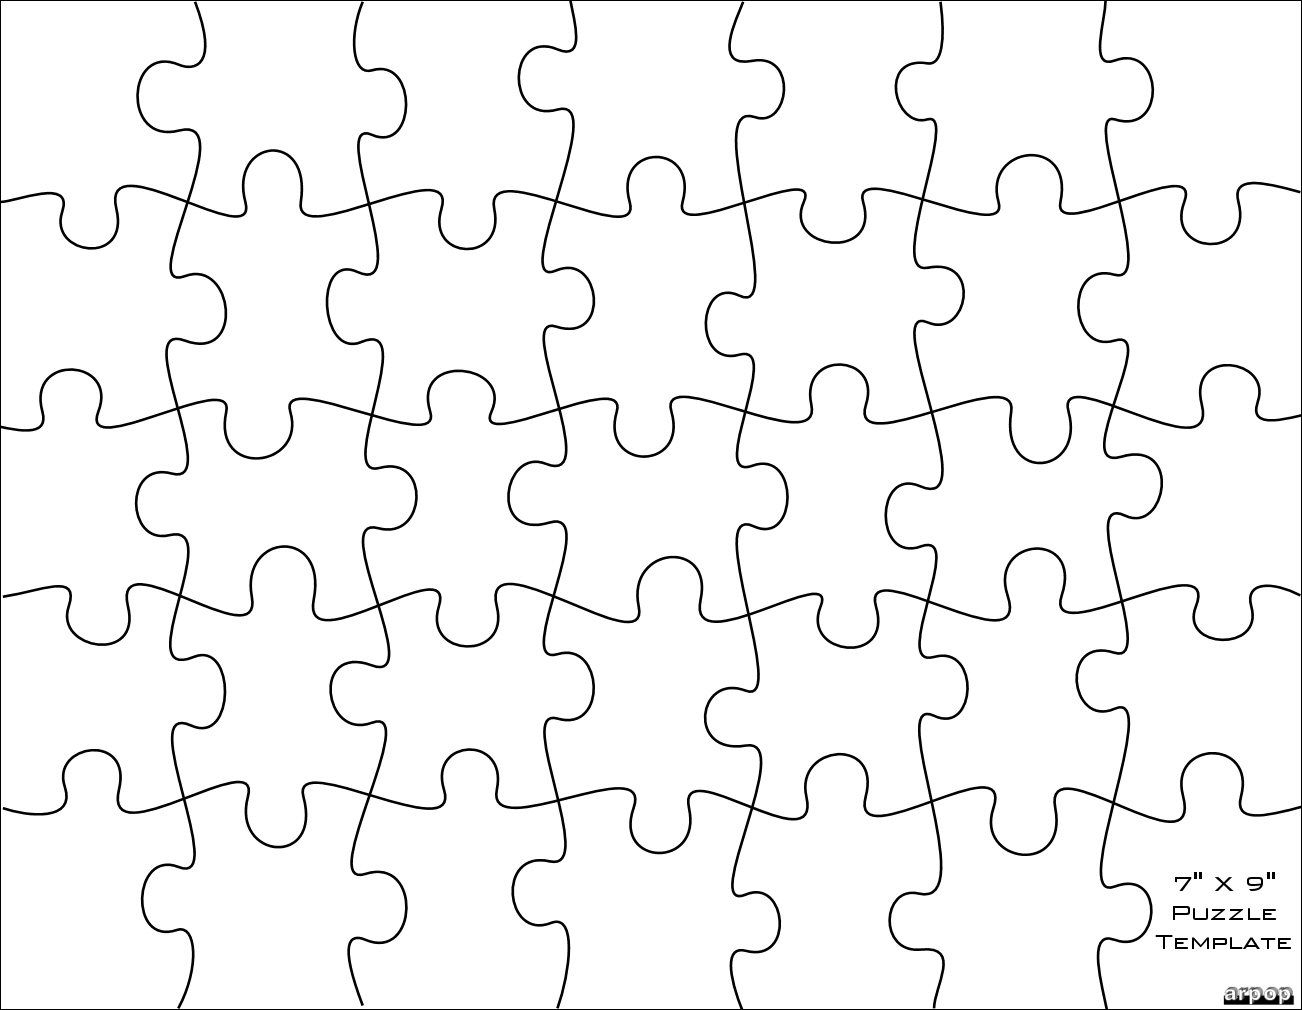 Free Scroll Saw Patternsarpop: Jigsaw Puzzle Templates | School - Printable Jigsaw Puzzles Maker